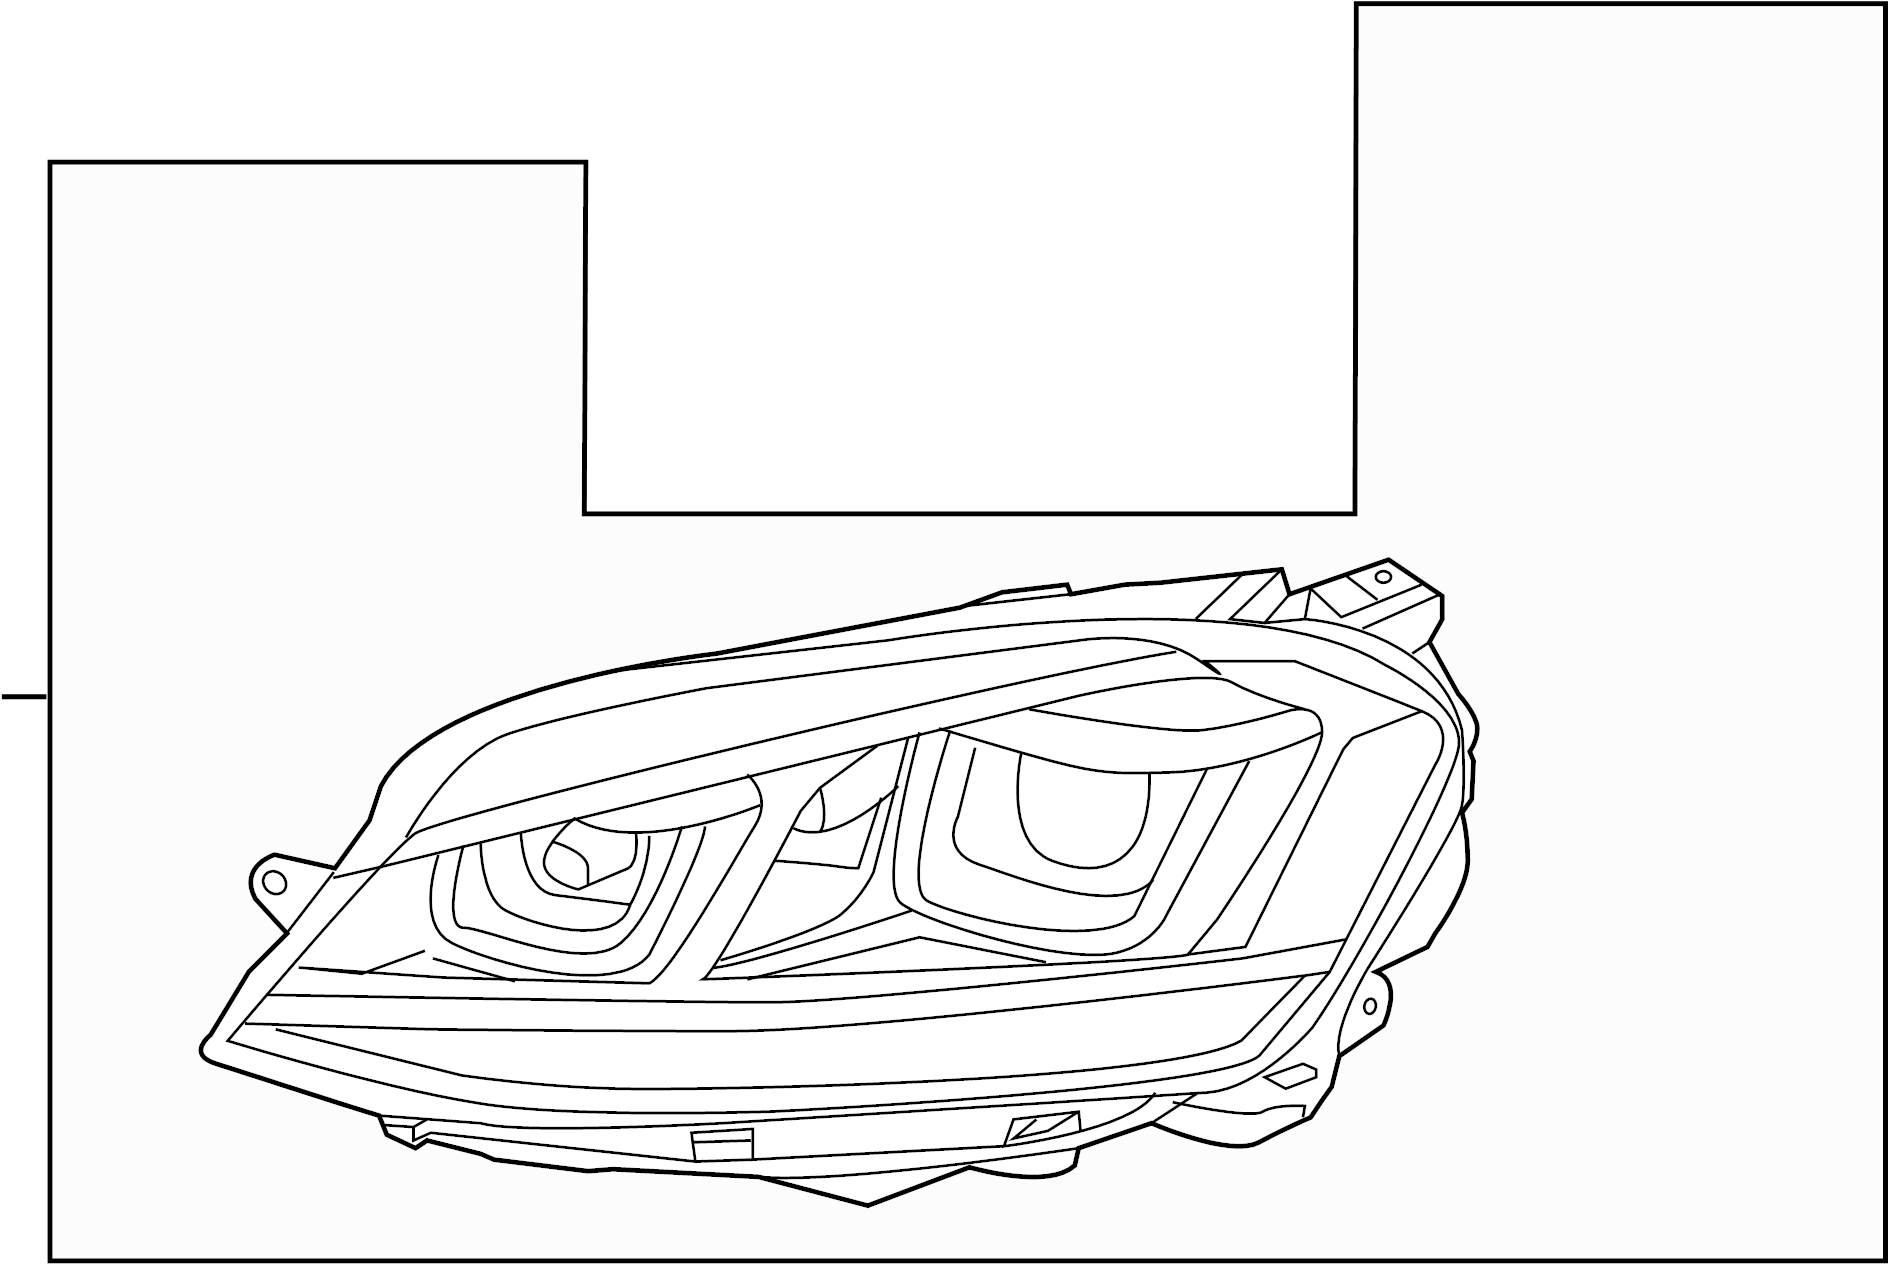 5gm941005c - headlight assembly  left  halogen  front